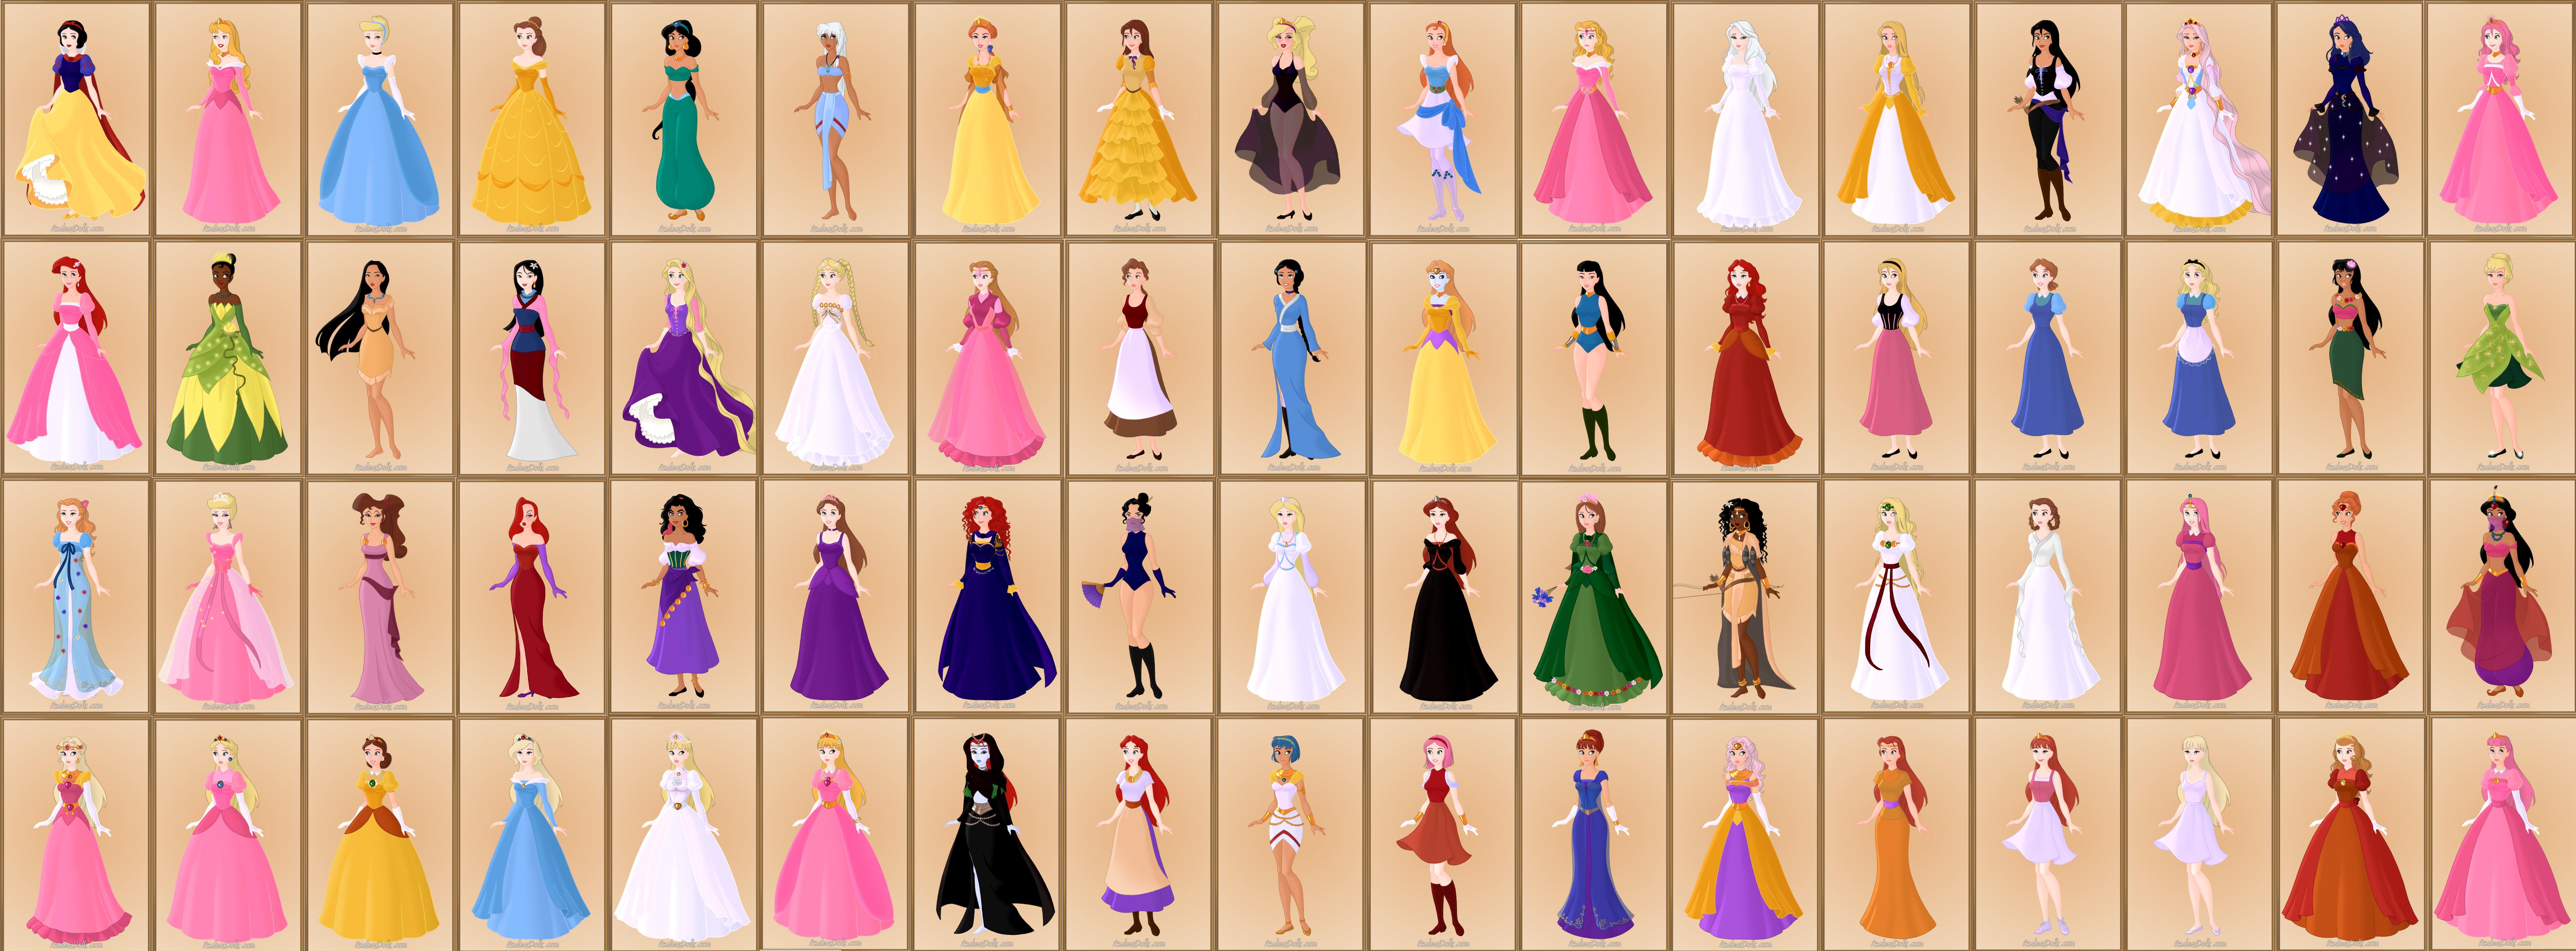 Disney Princes Names List Disney princess, non princess